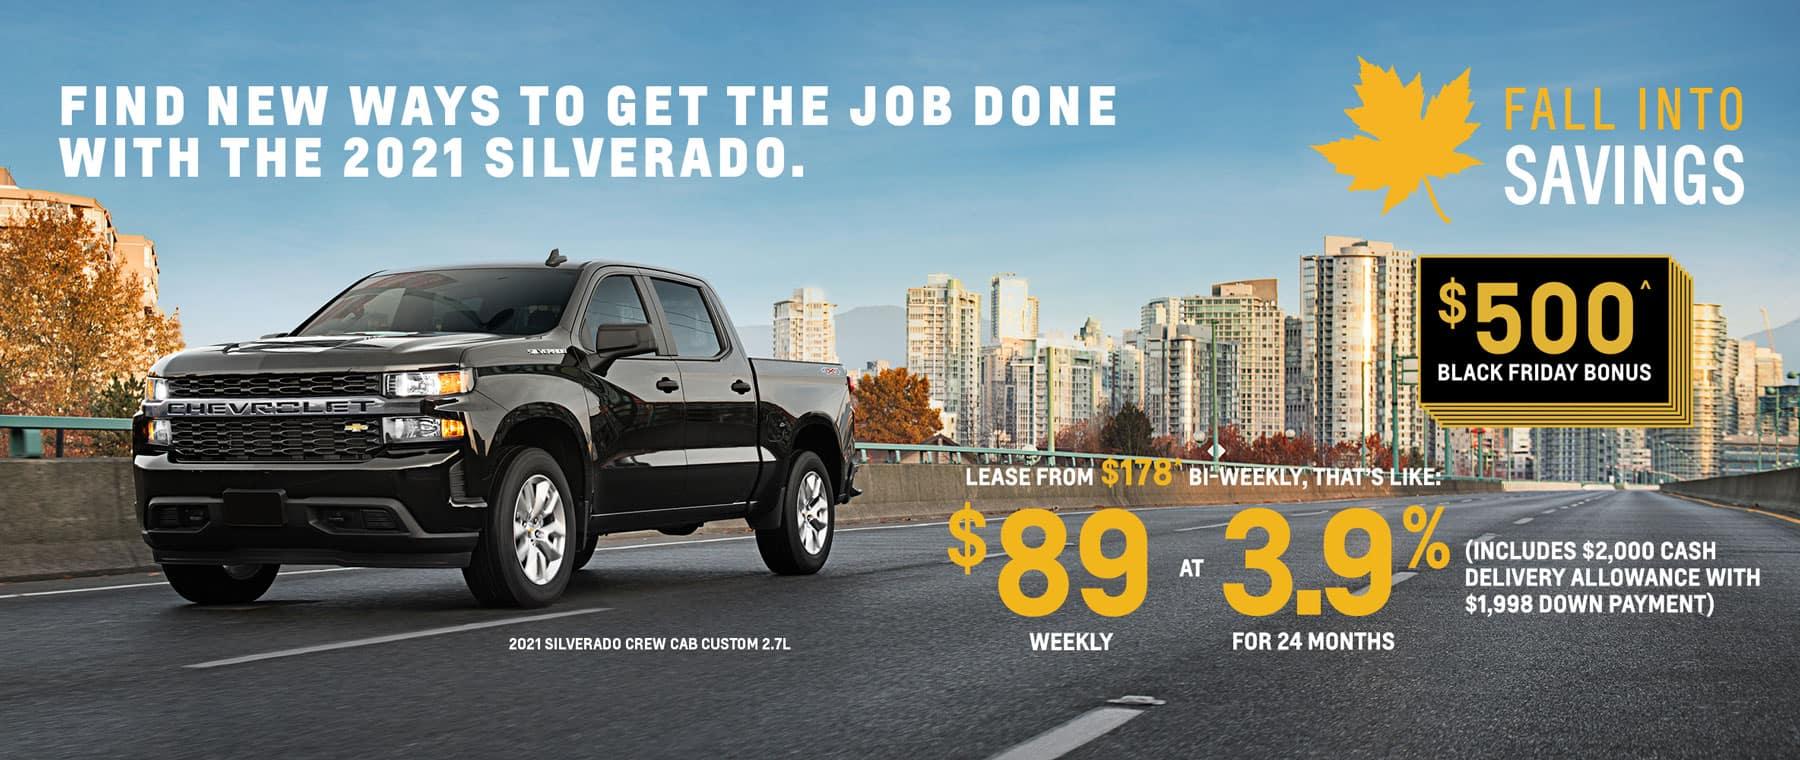 PR09629-NOVEMBER_SILVERADO_FRIDAY_FALL_1800X760_EN